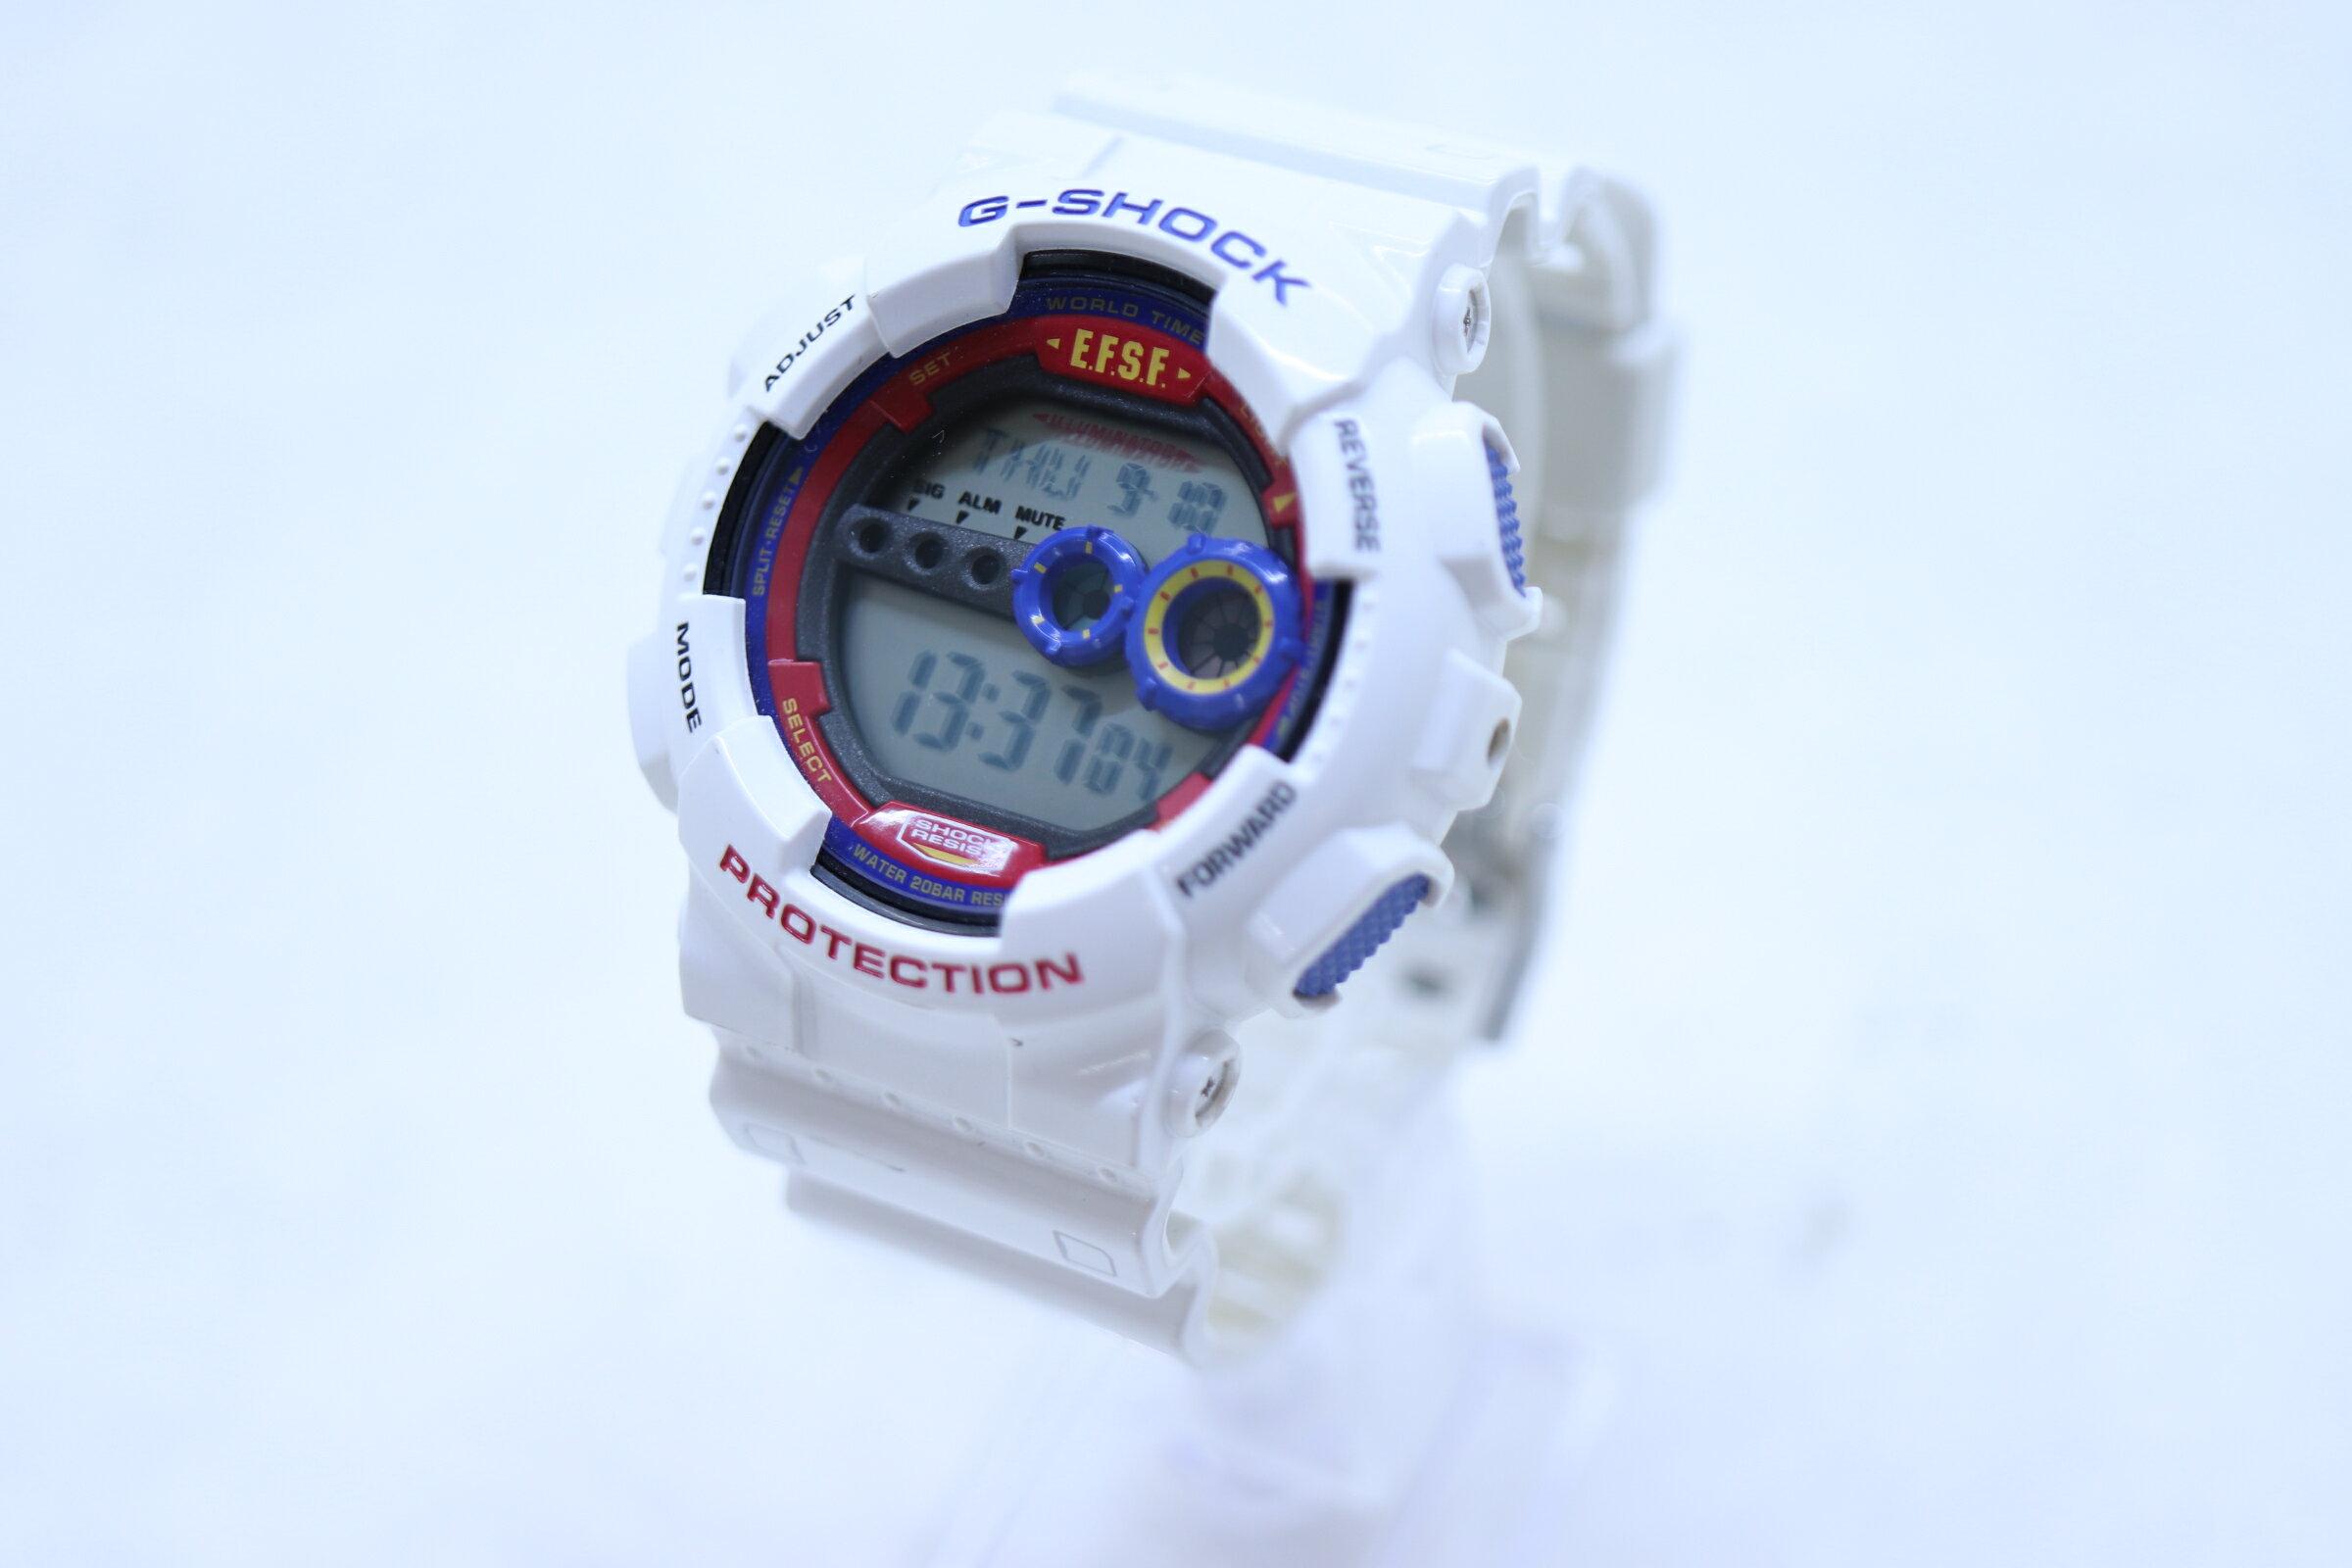 腕時計, メンズ腕時計 G-SHOCK GUMDAM 35 GD-100 7900146Kz